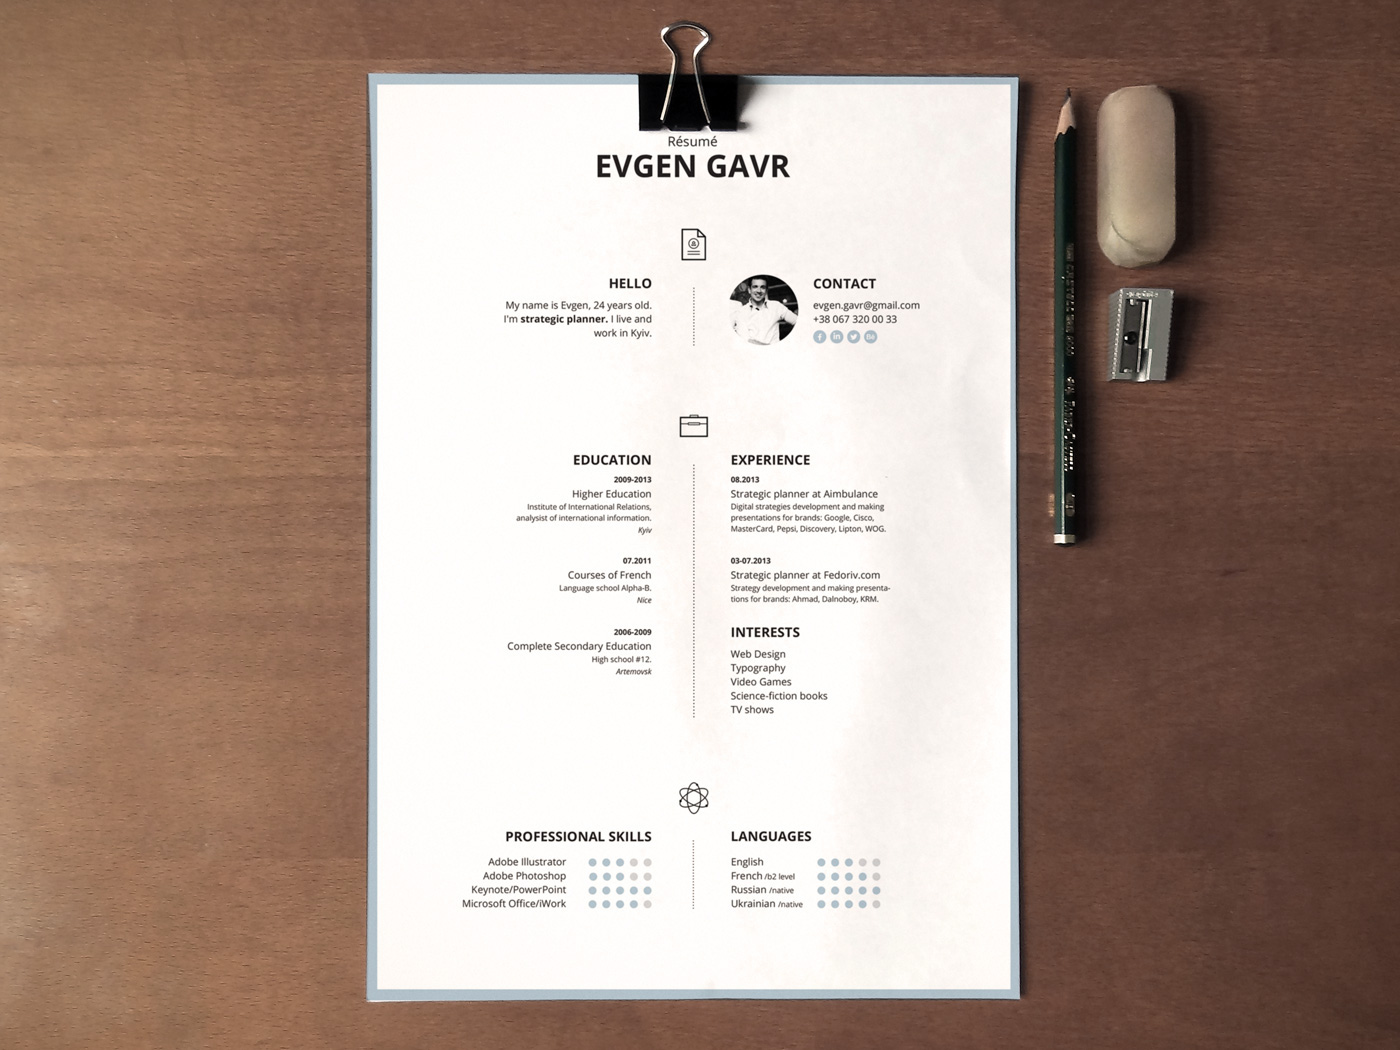 Resume resume template CV Curriculum Vitae clean resume Modern Resume CV template word pages word resume pages resume word cv pages cv PRO CV